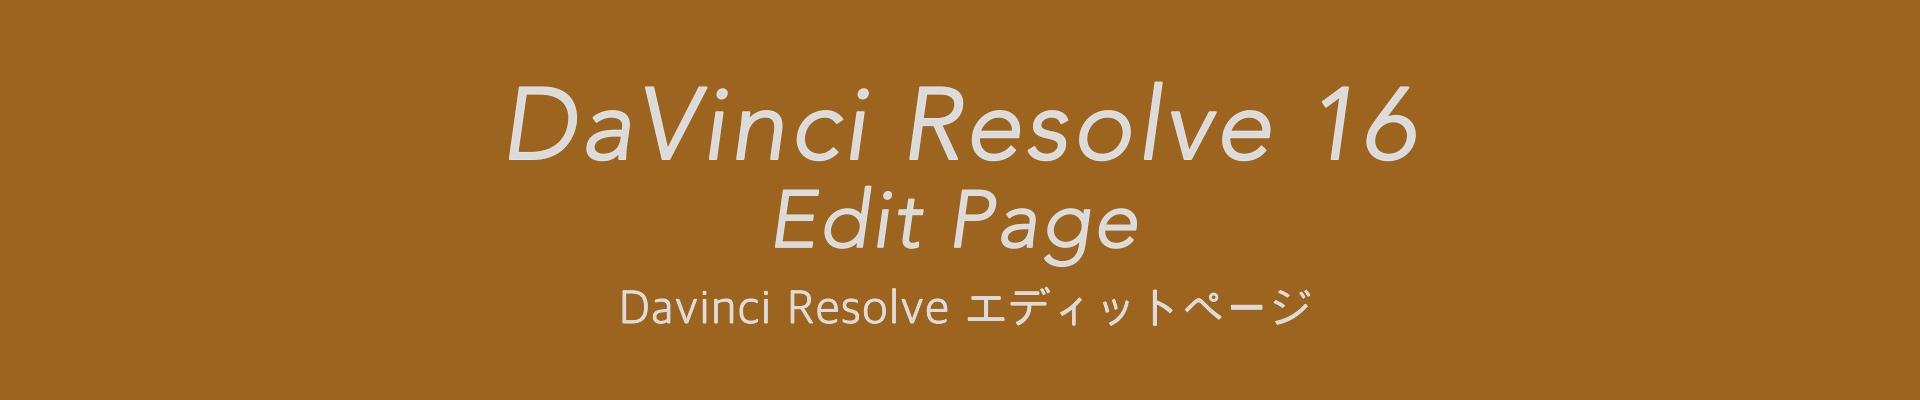 DaVinci Resolve 16 エディットページ